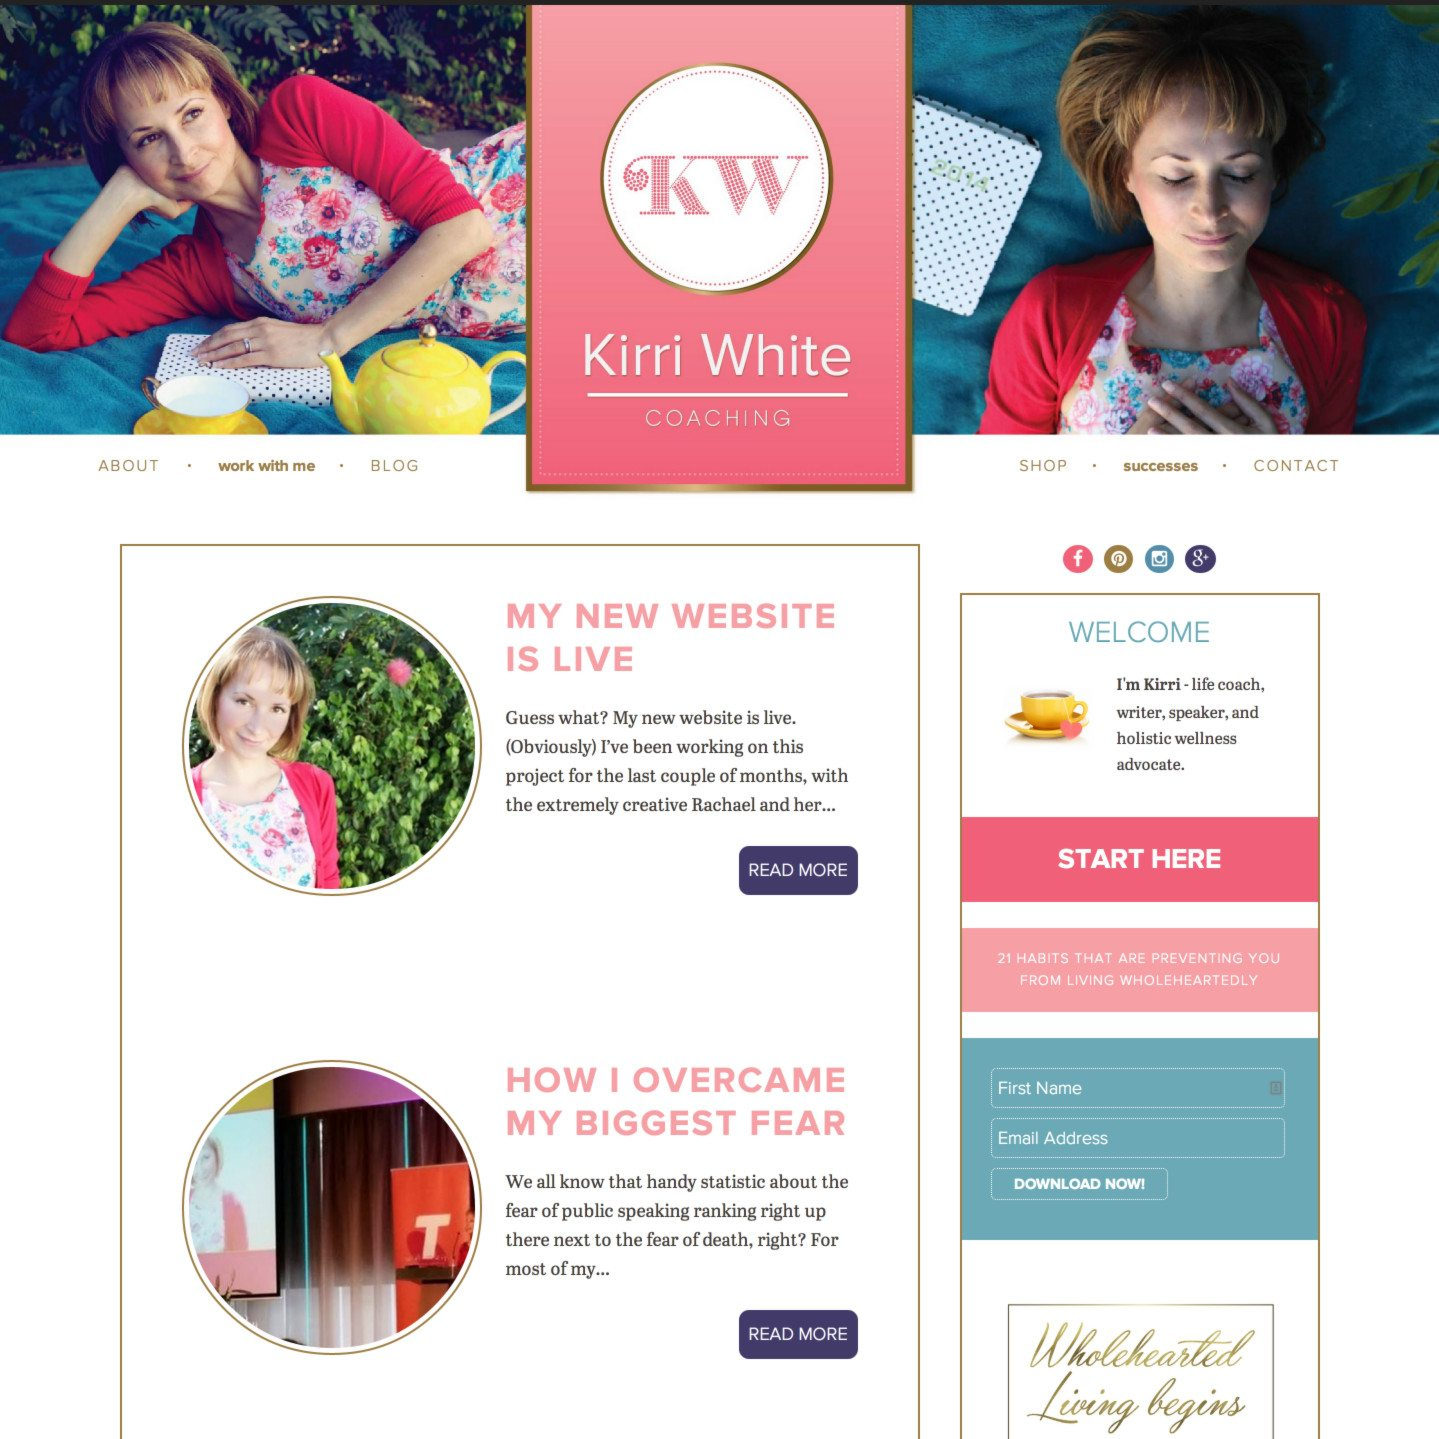 Kirri White Coaching WordPress Web Design by RKA ink